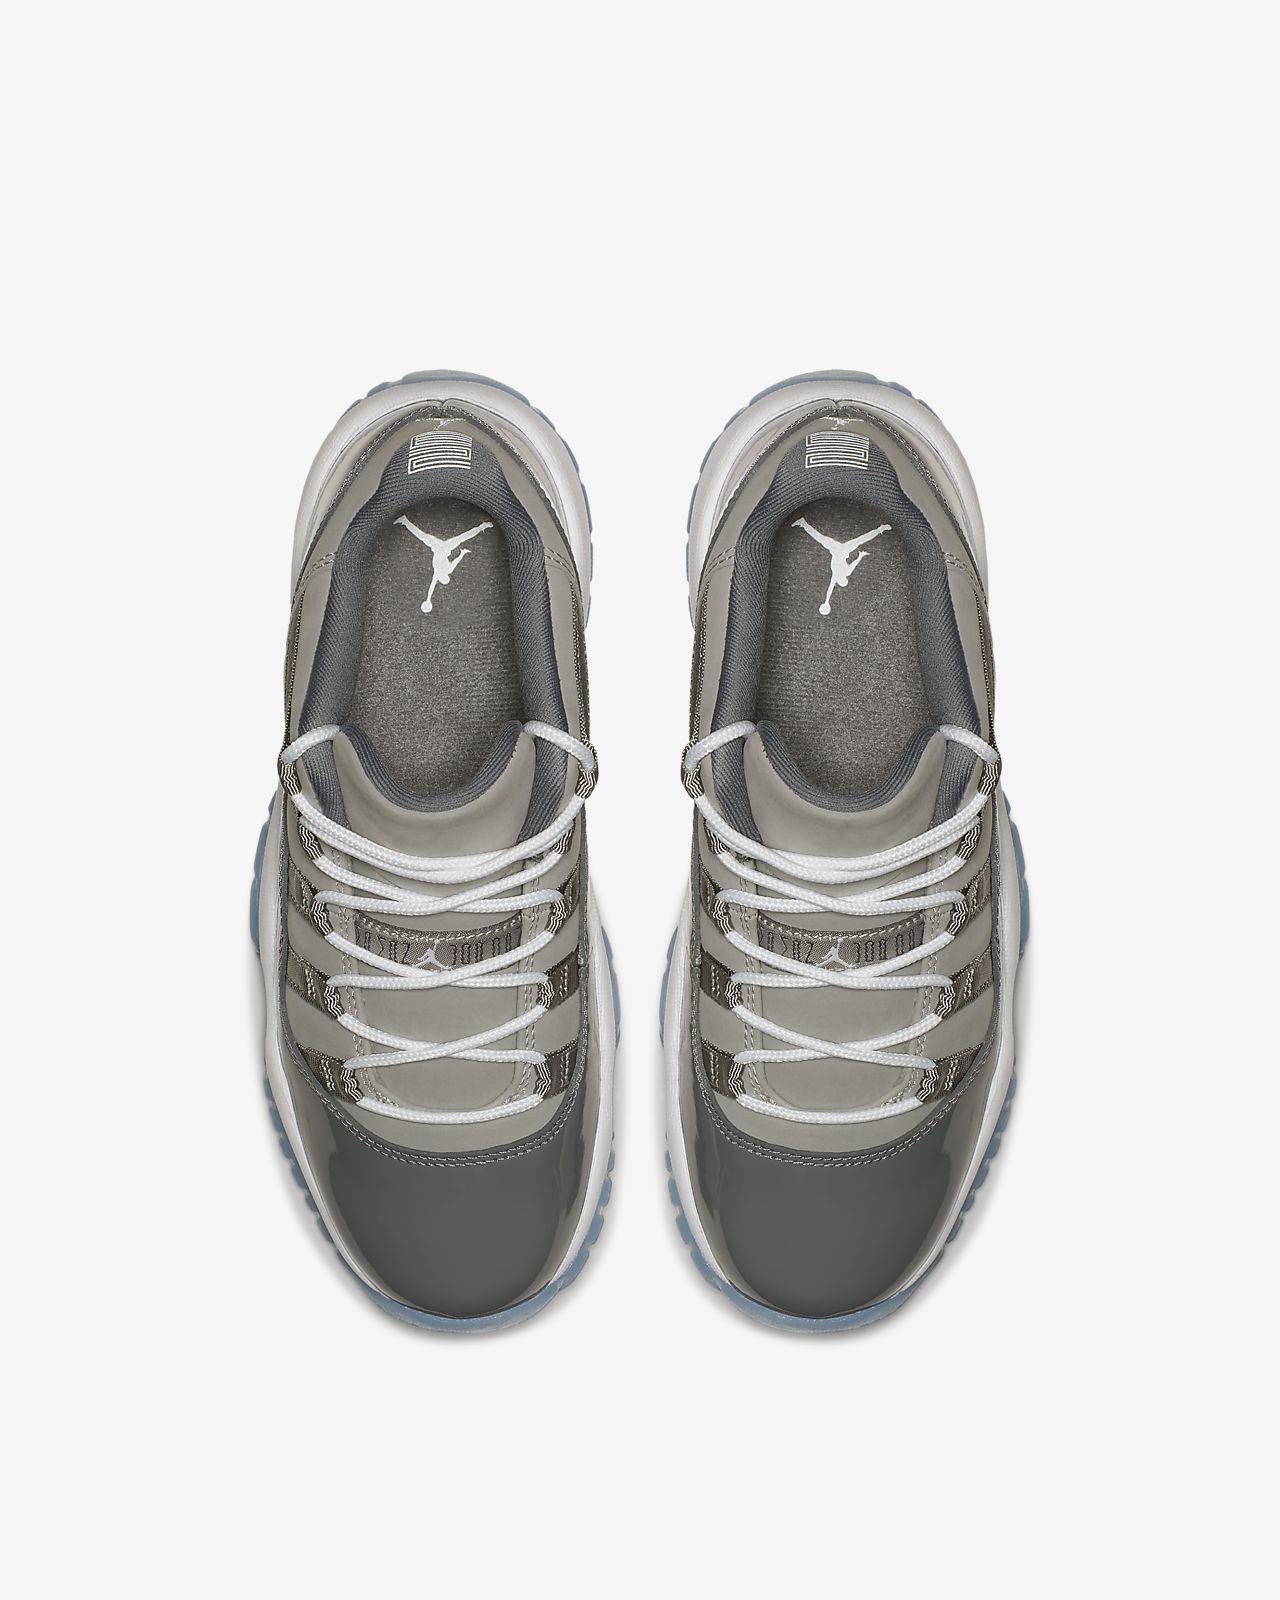 super popular c6e5c bd307 ... Air Jordan 11 Retro Low Older Kids  Shoe